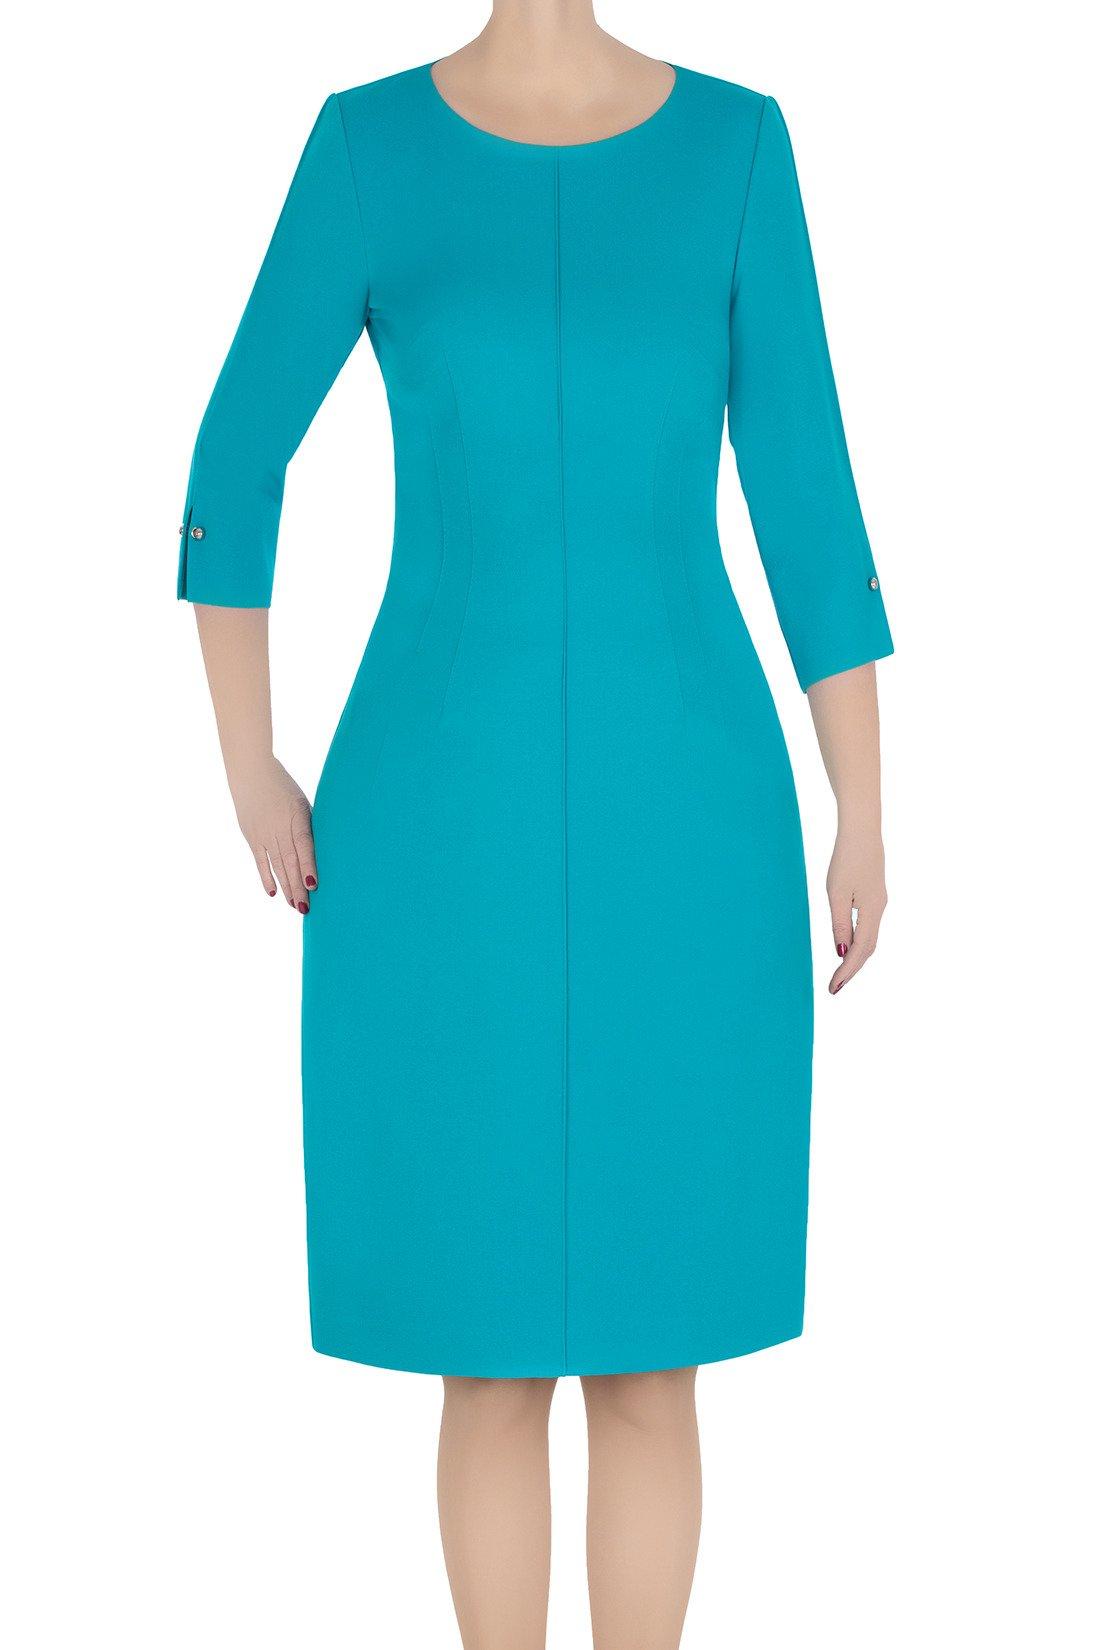 663d768b370da Klasyczna sukienka damska Dagon 2786 morska | sklep internetowy Modon.pl